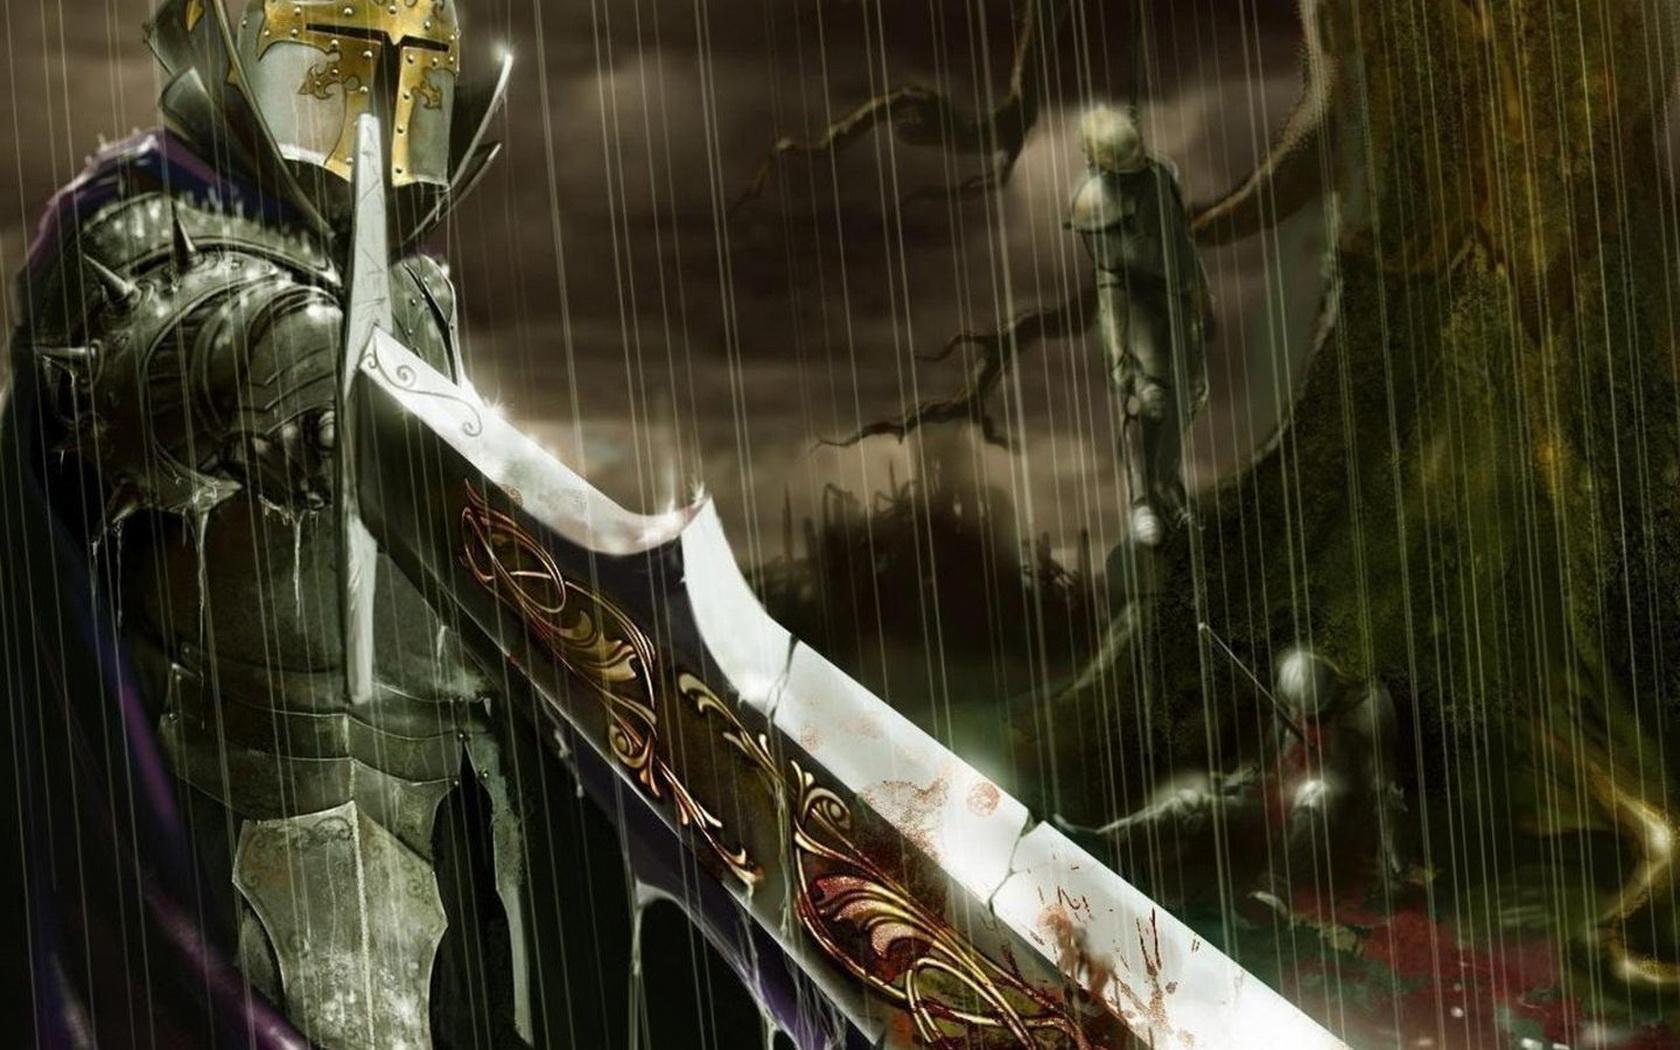 Zastaki.com - Кровавый рыцарь